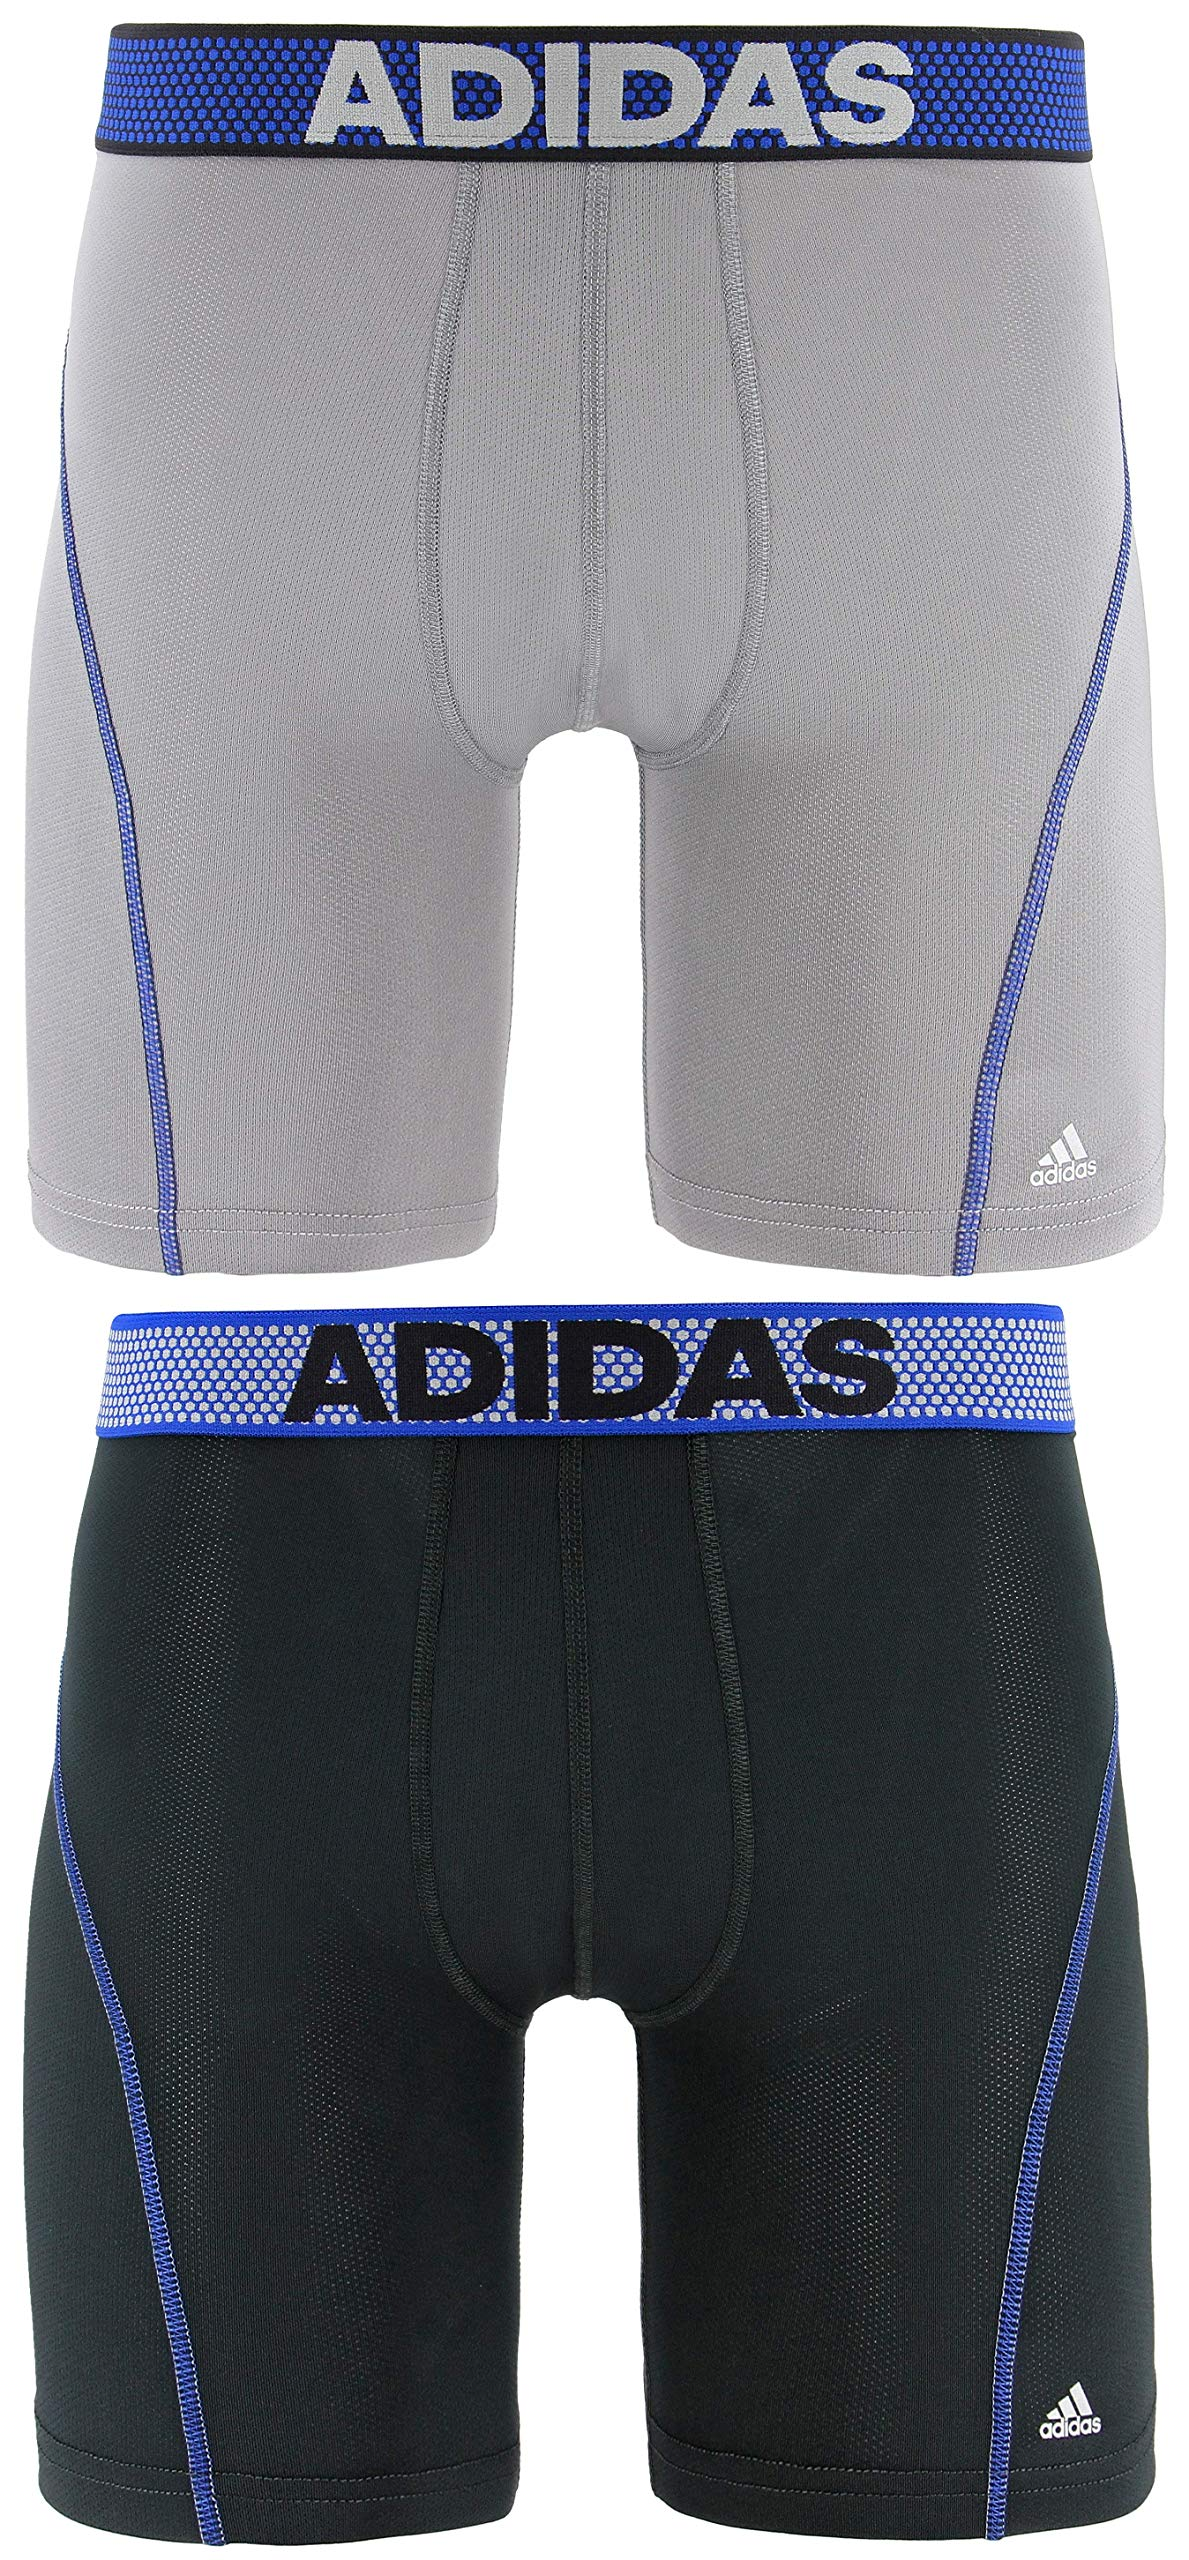 adidas Men's Sport Performance Mesh Midway Underwear (2-Pack), Light Onix/Blue Night Grey/Light Onix/Blue, X-LARGE by adidas